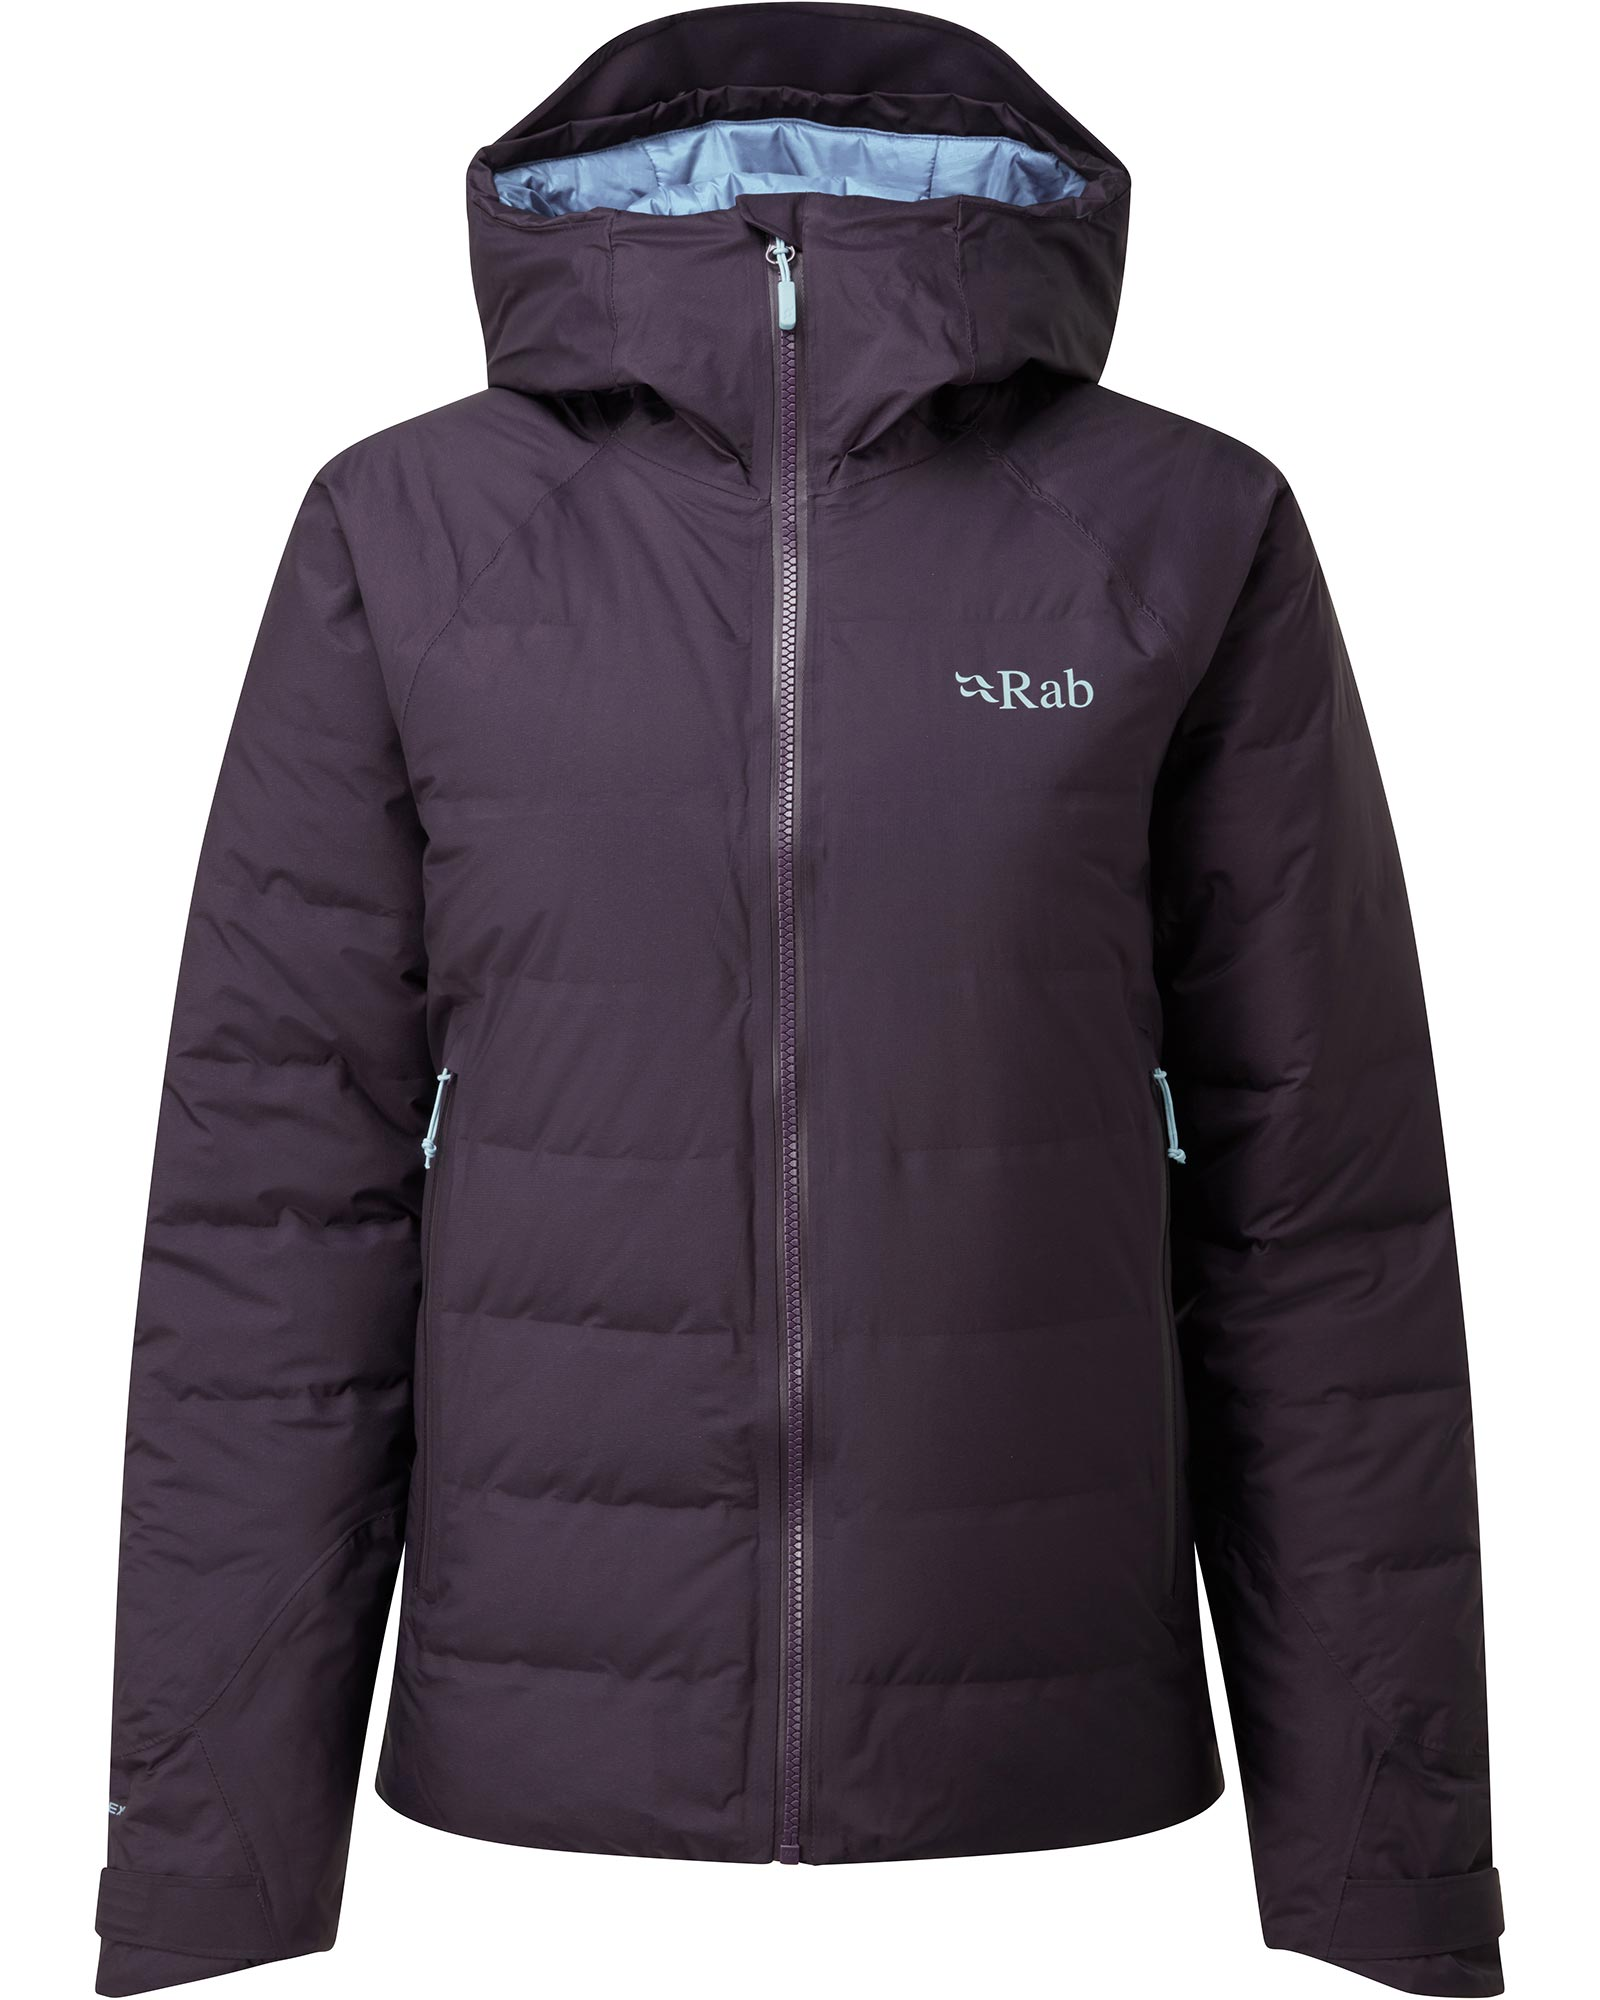 Rab Women's Valiance Jacket 0